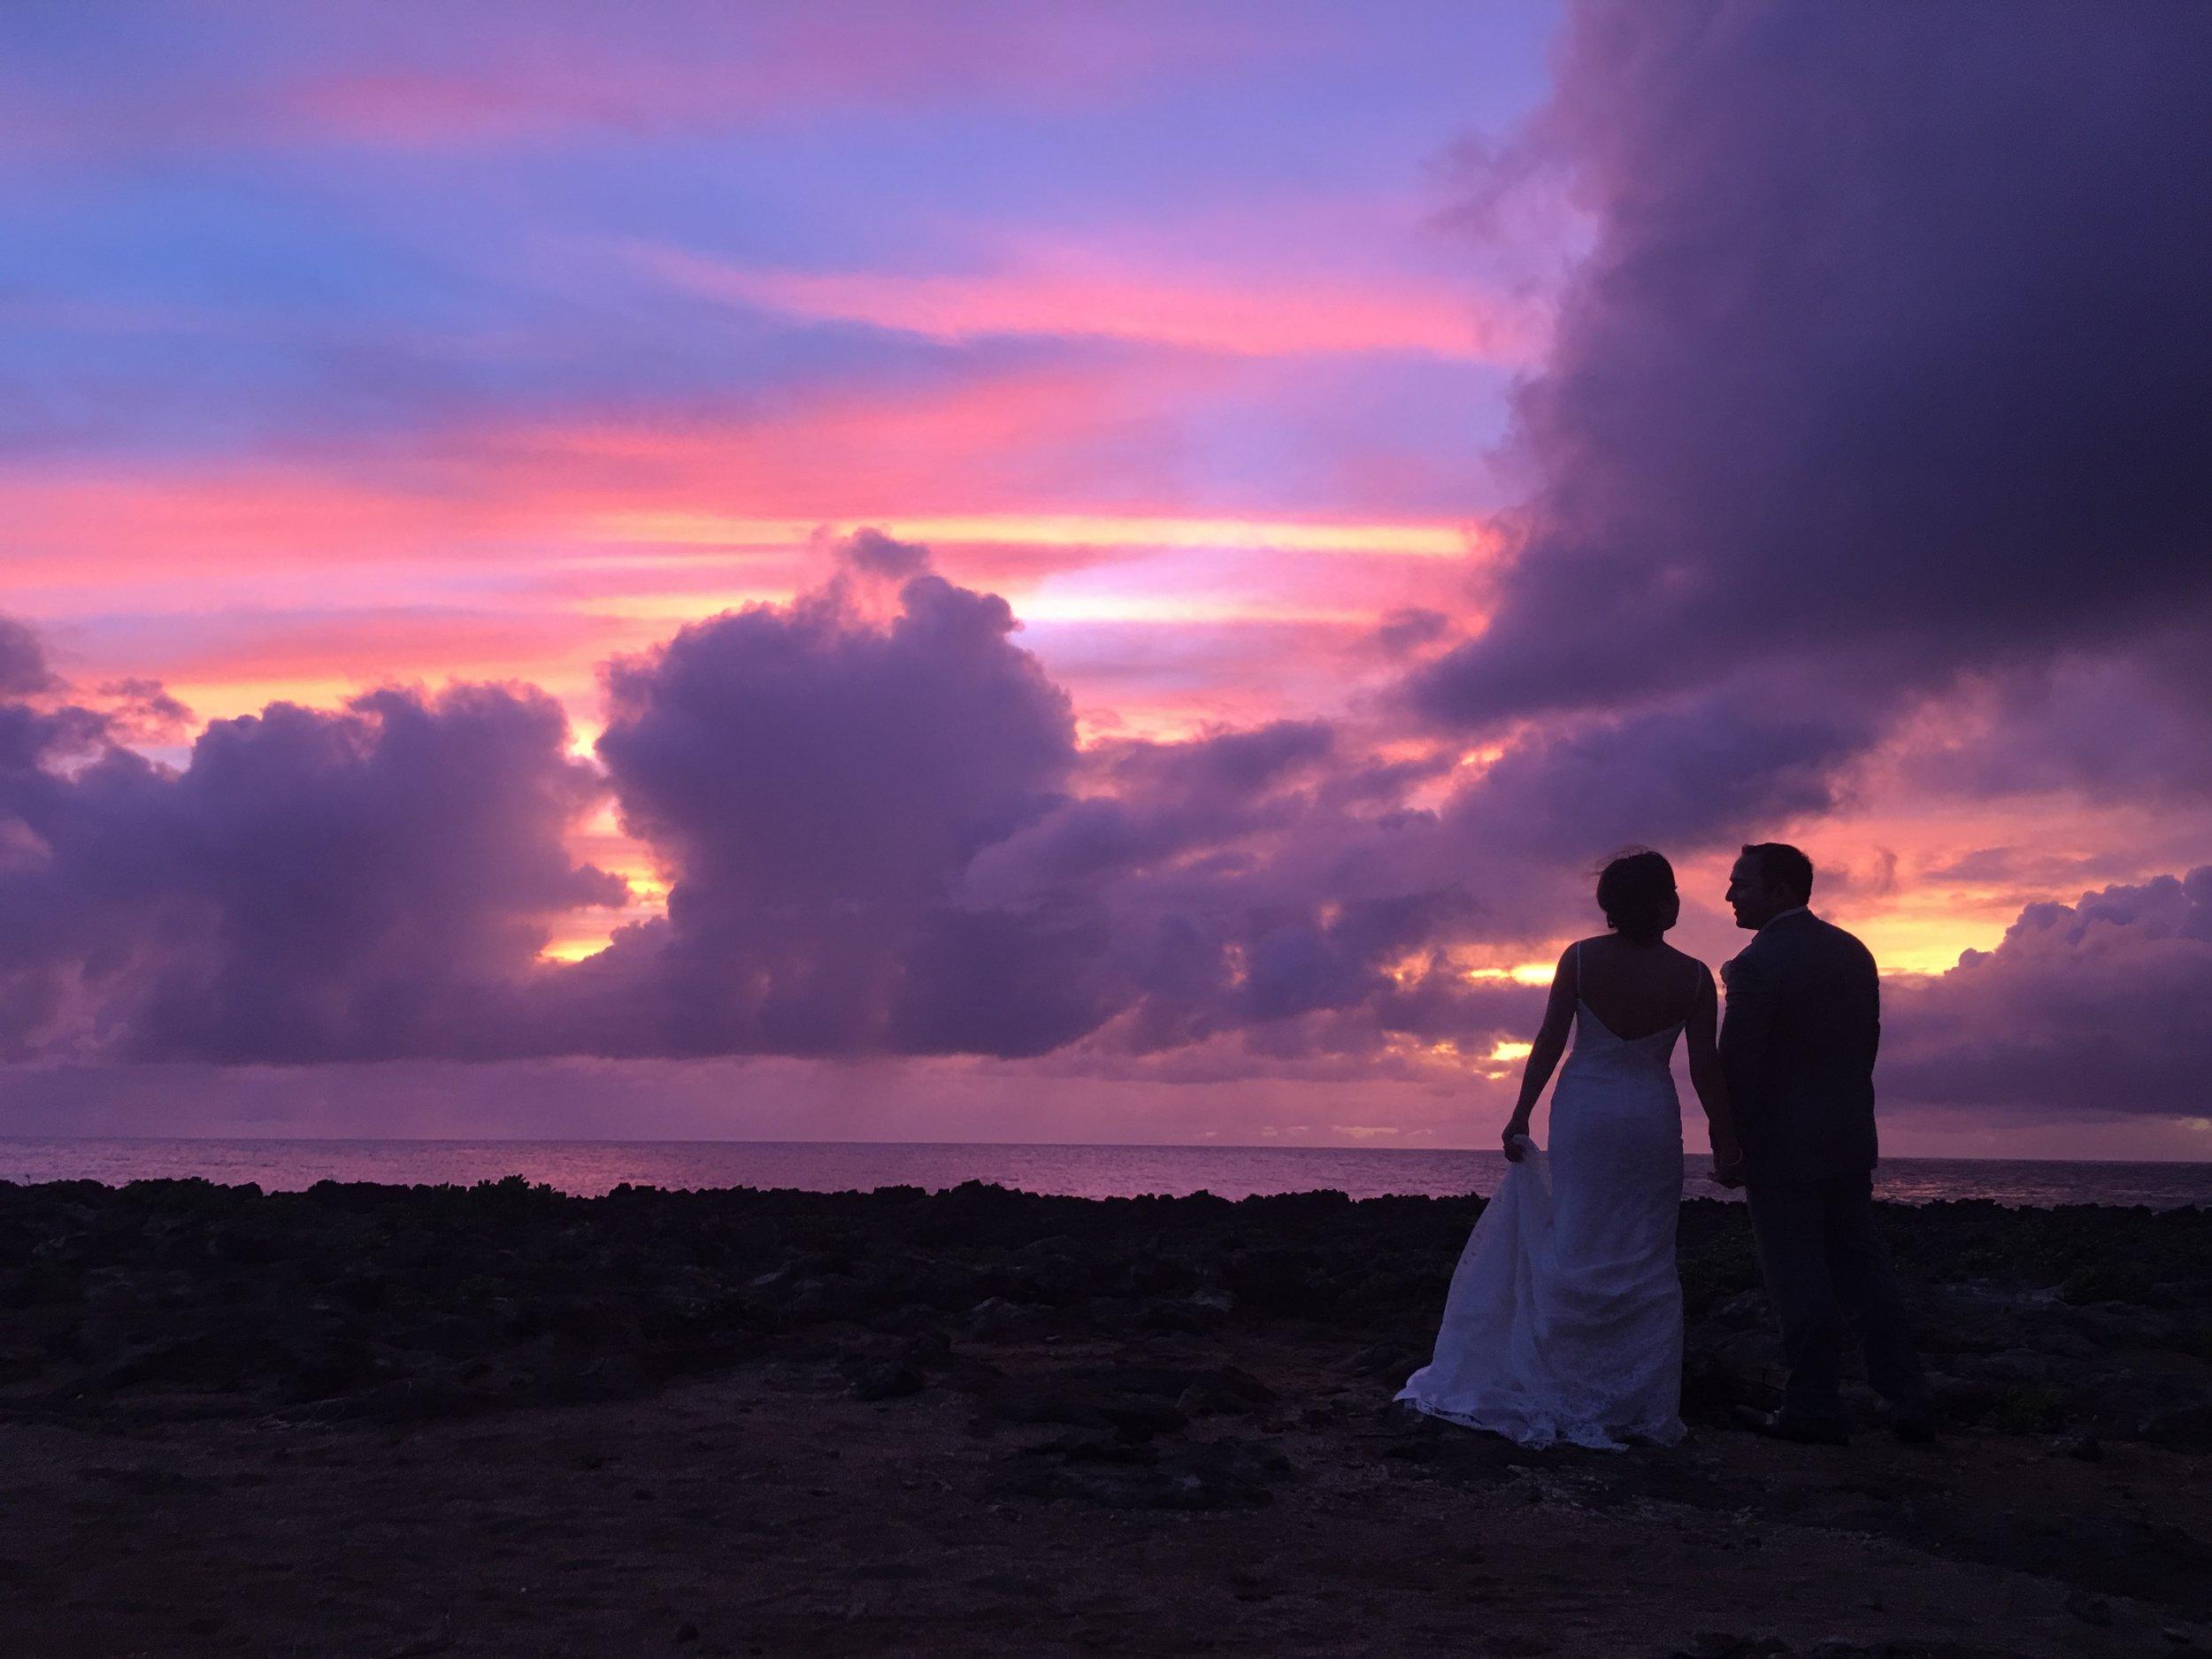 sunset-bride